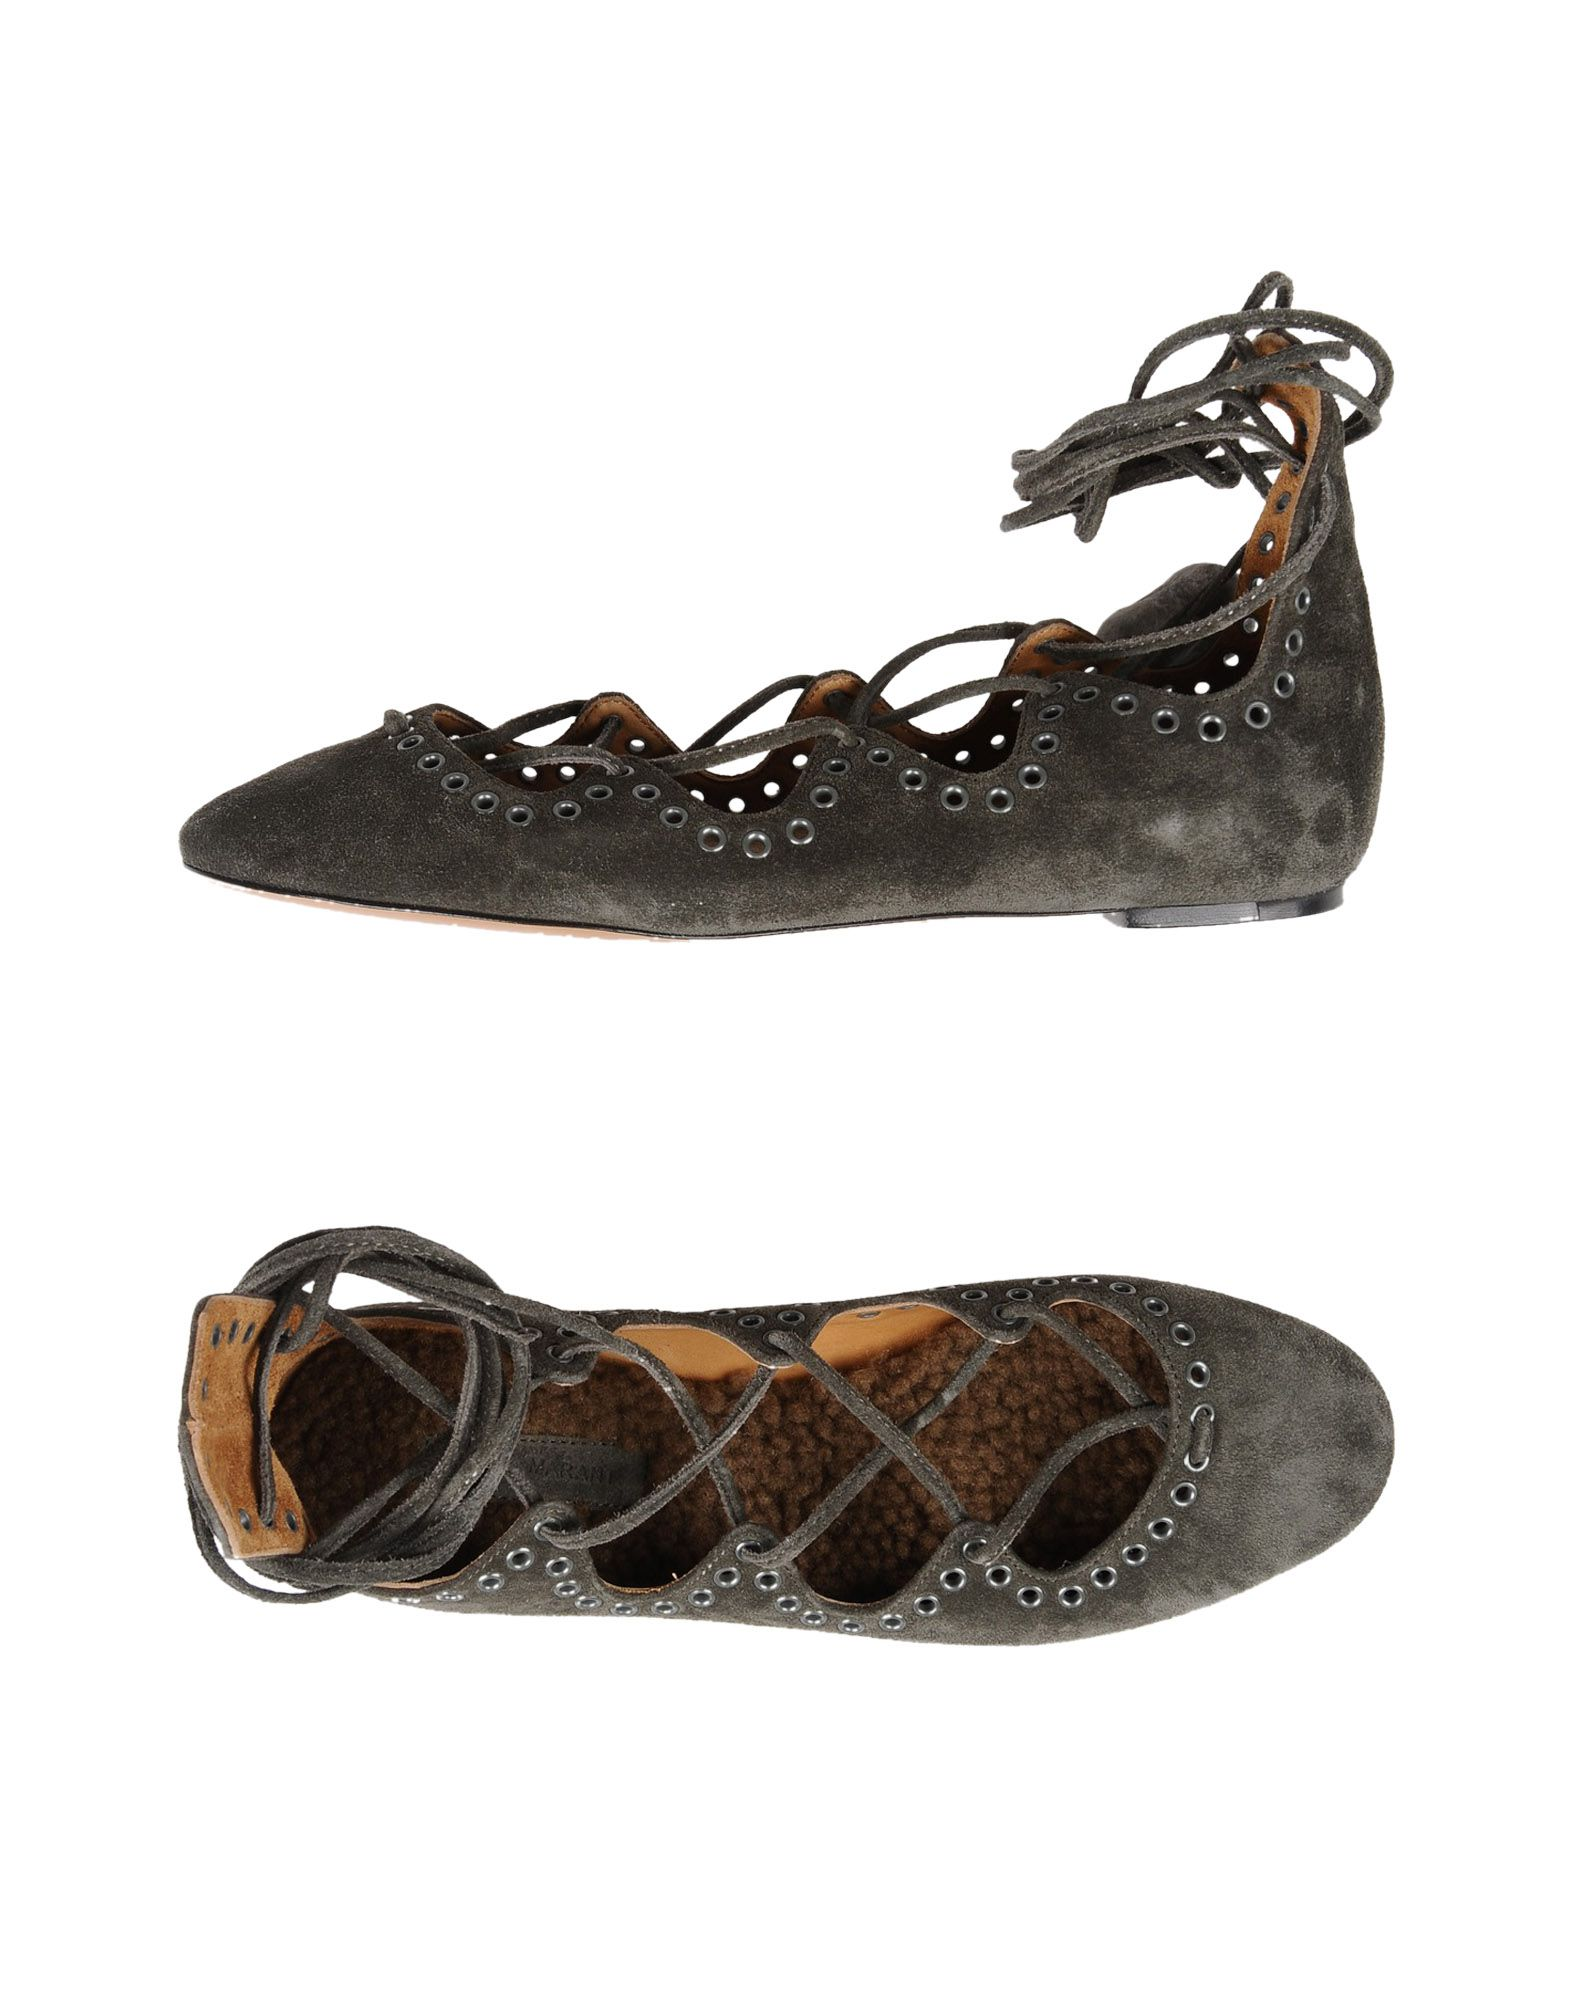 Rabatt Schuhe Isabel Marant Ballerinas Damen  11245271OB